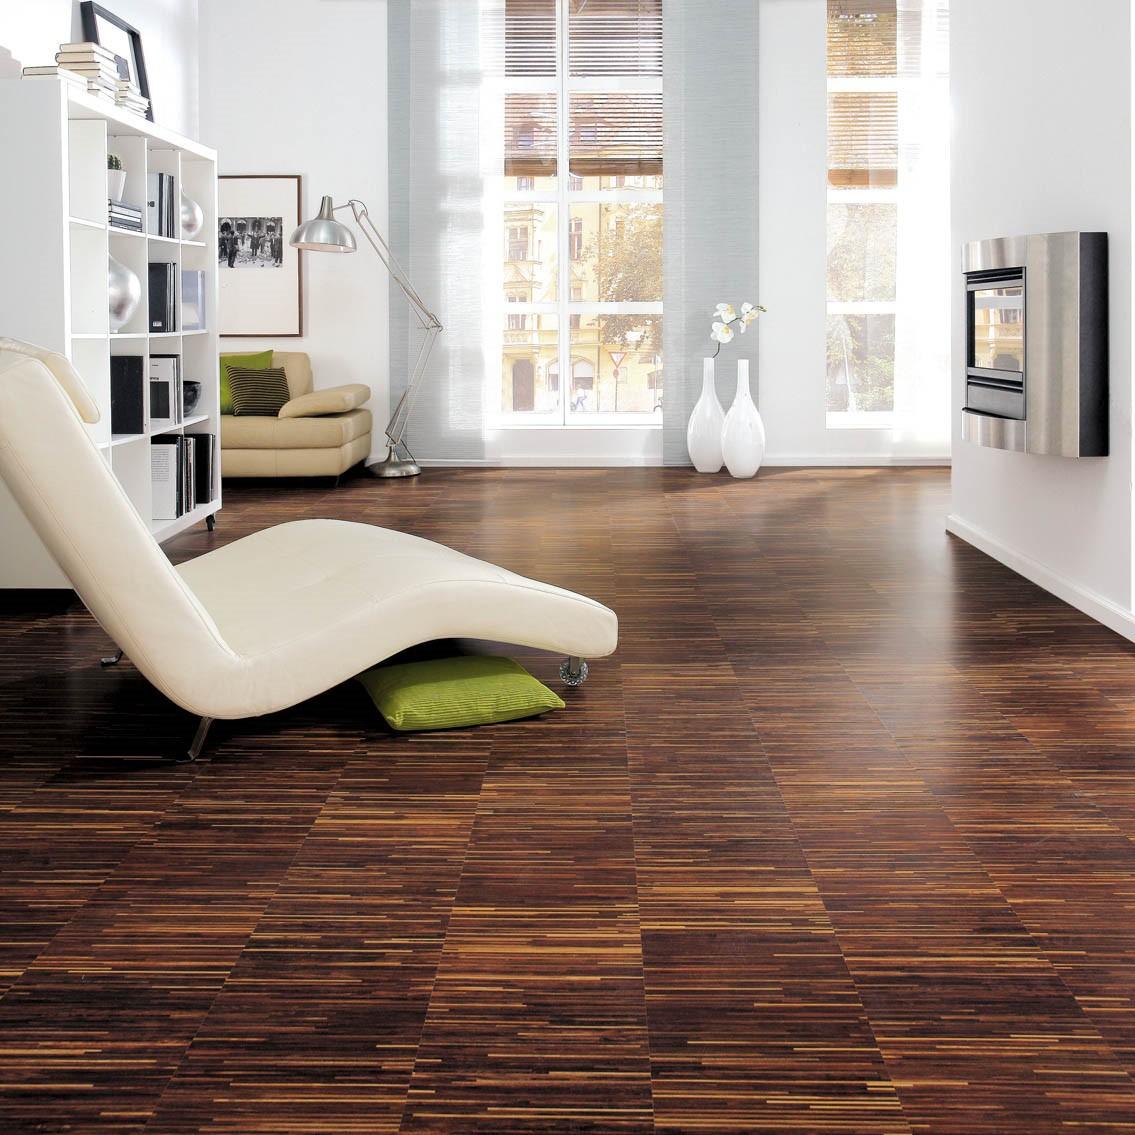 haro kork arteo stripes permadur corkett 2 wahl 12 m kork bodenverkauf. Black Bedroom Furniture Sets. Home Design Ideas